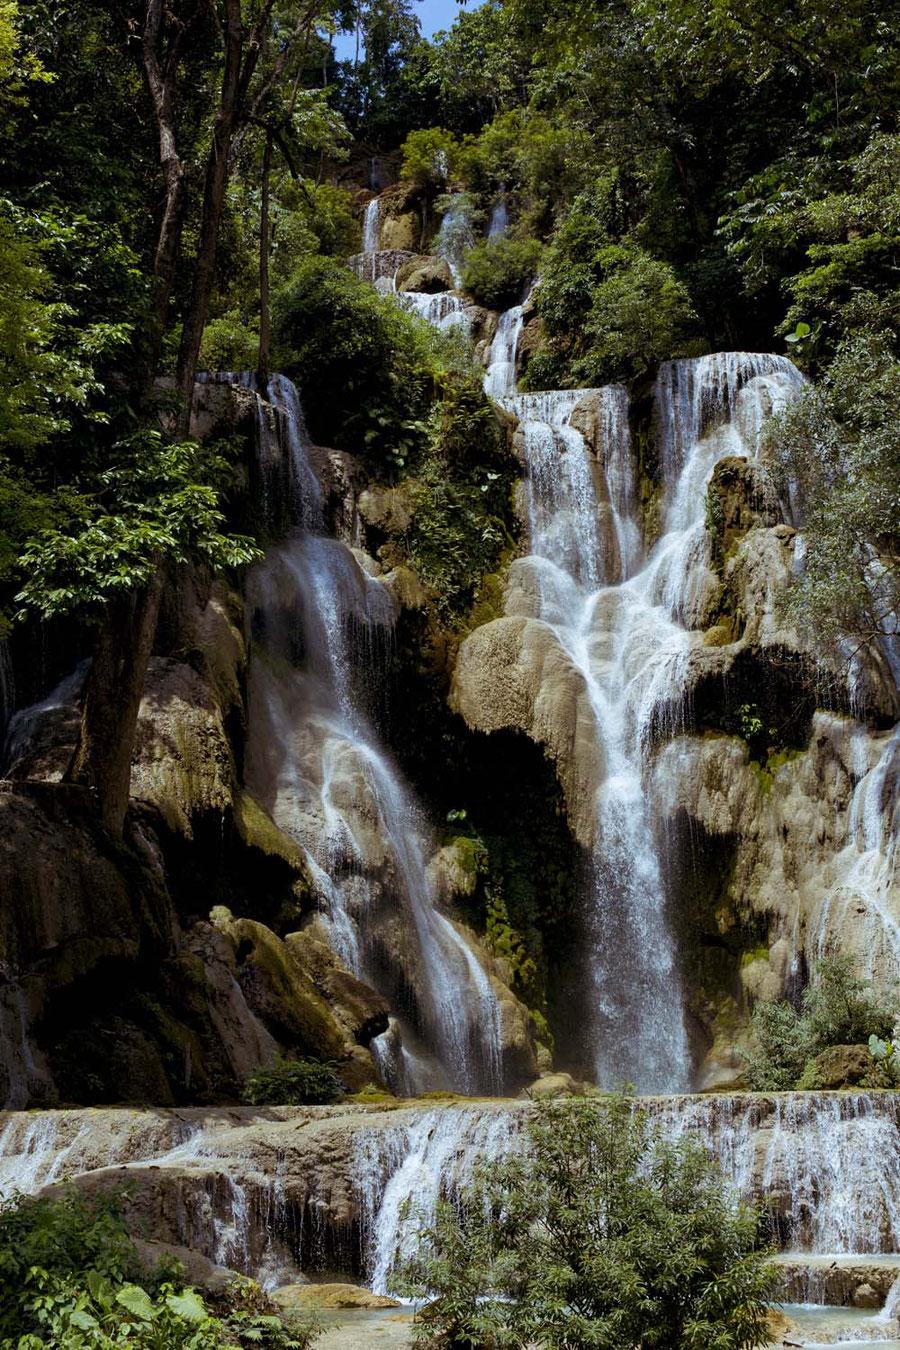 Kuang Si Wasserfall in seiner vollen Pracht, bei Luang Prabang, Laos